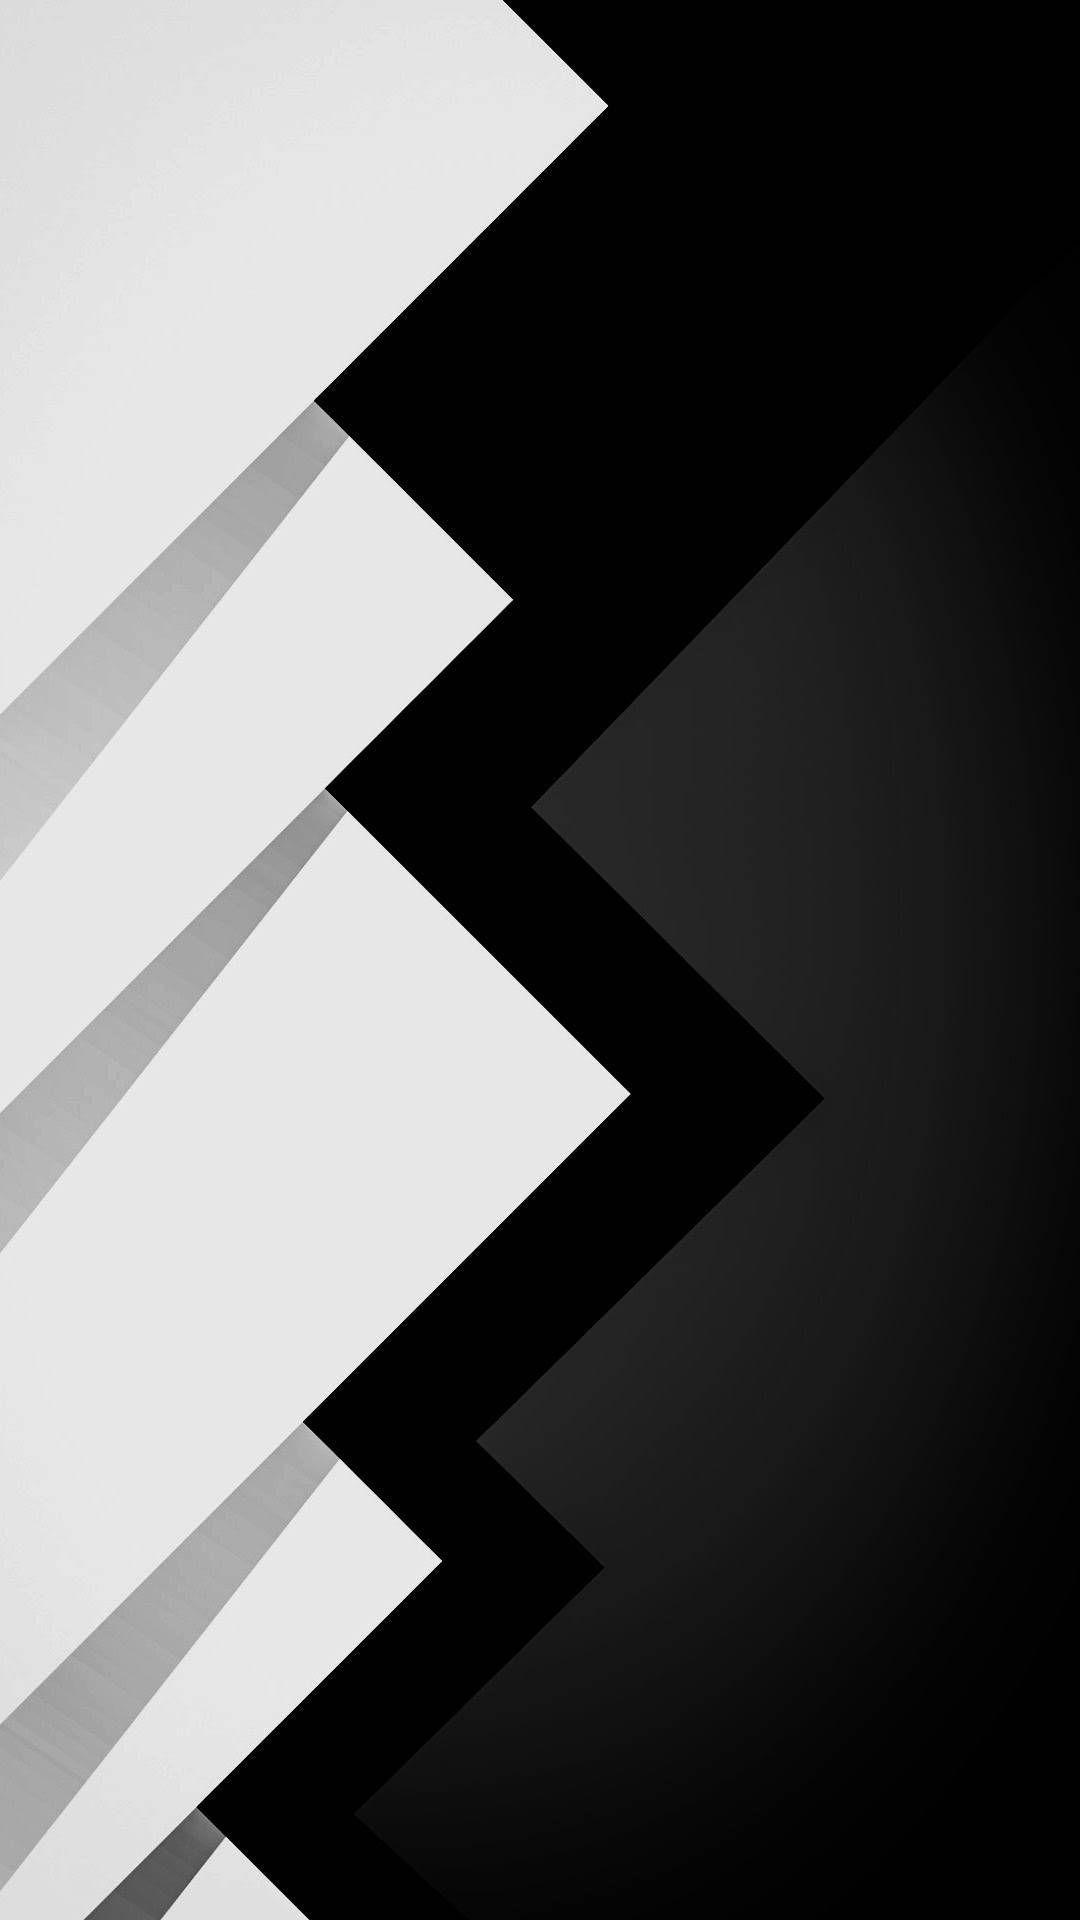 Pin By Iyan Sofyan On Material Minimal Pattern White Pattern